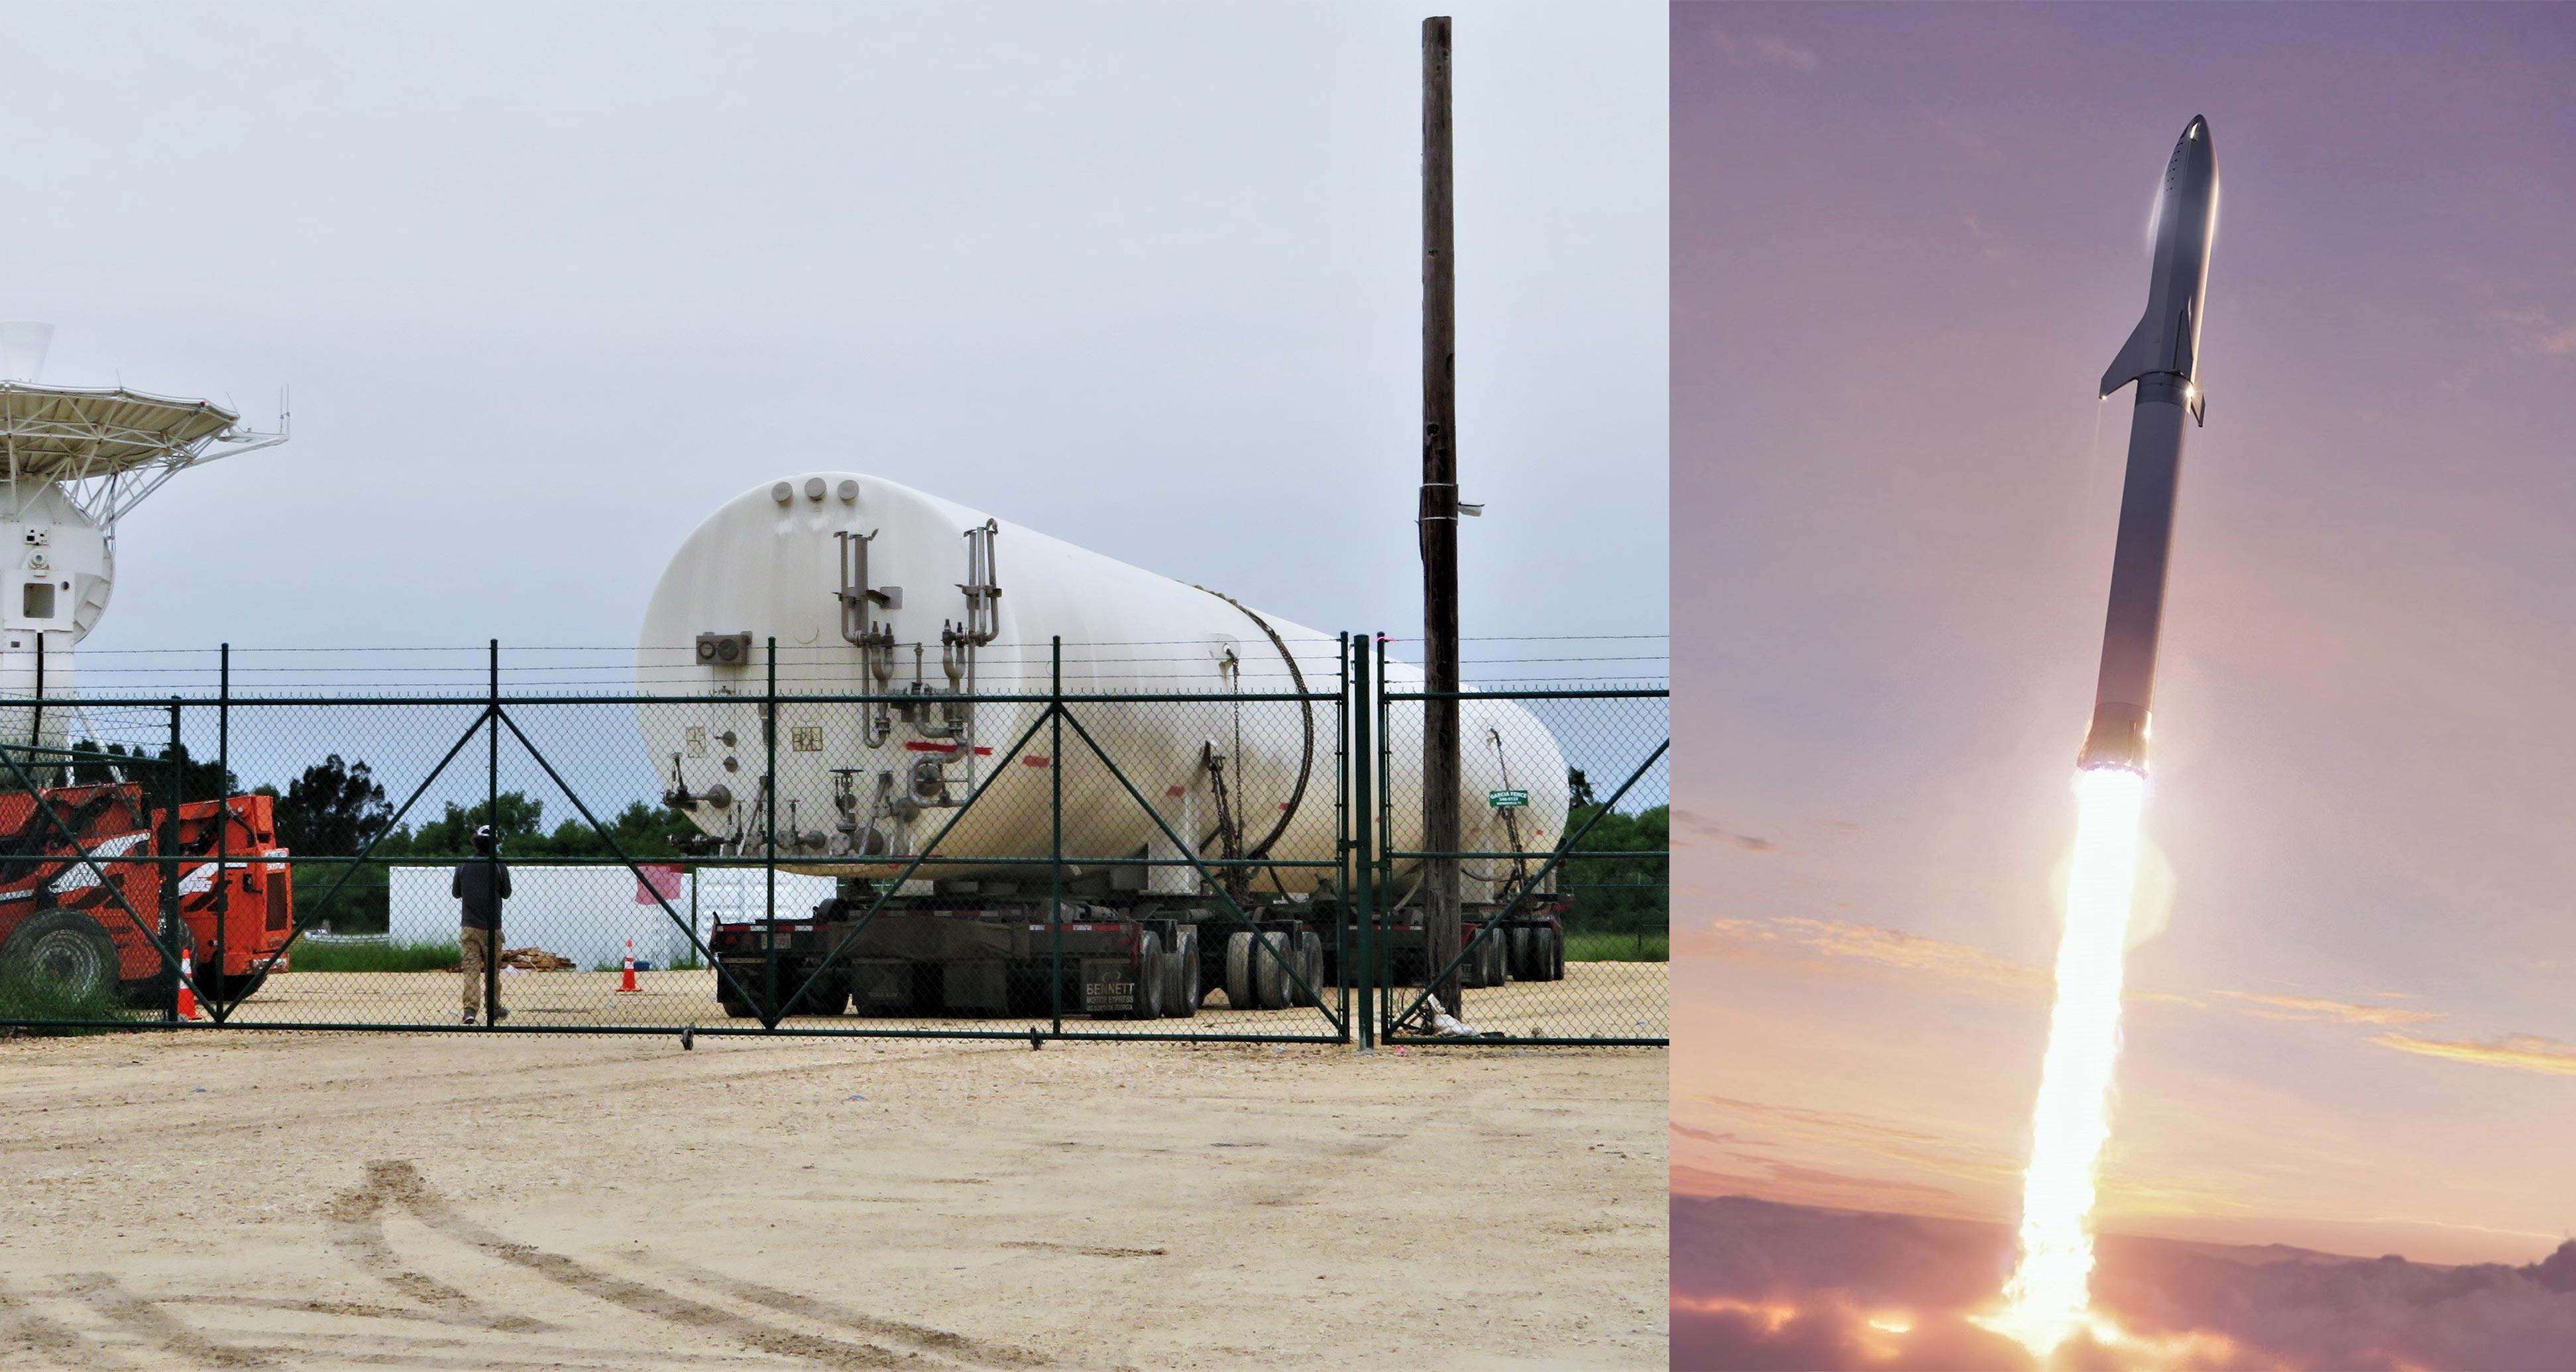 LNG tank arrival 102318 + BFR (bocachicagal) feature